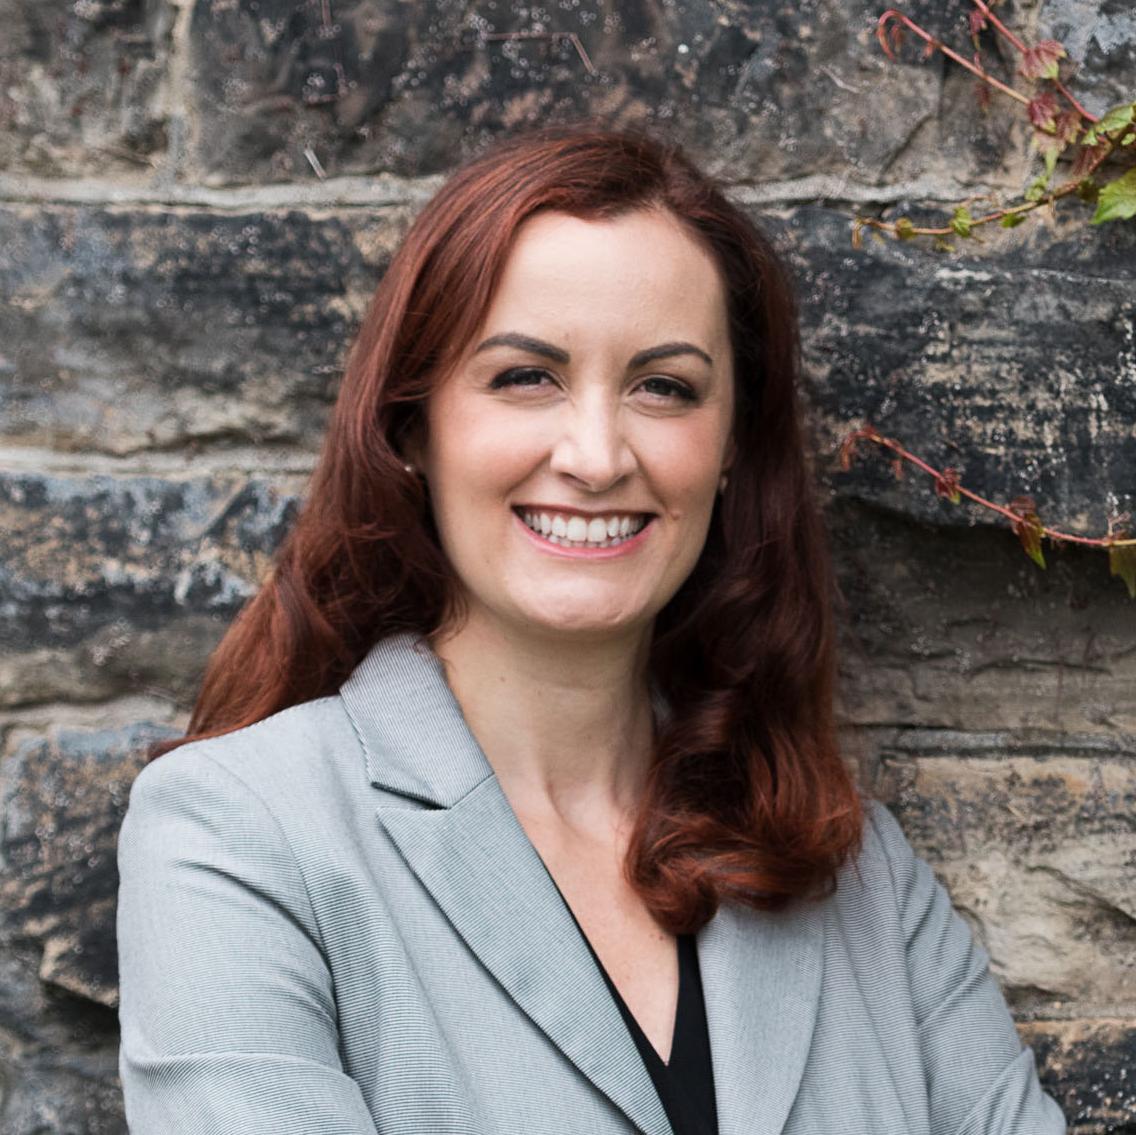 Laura Rosella